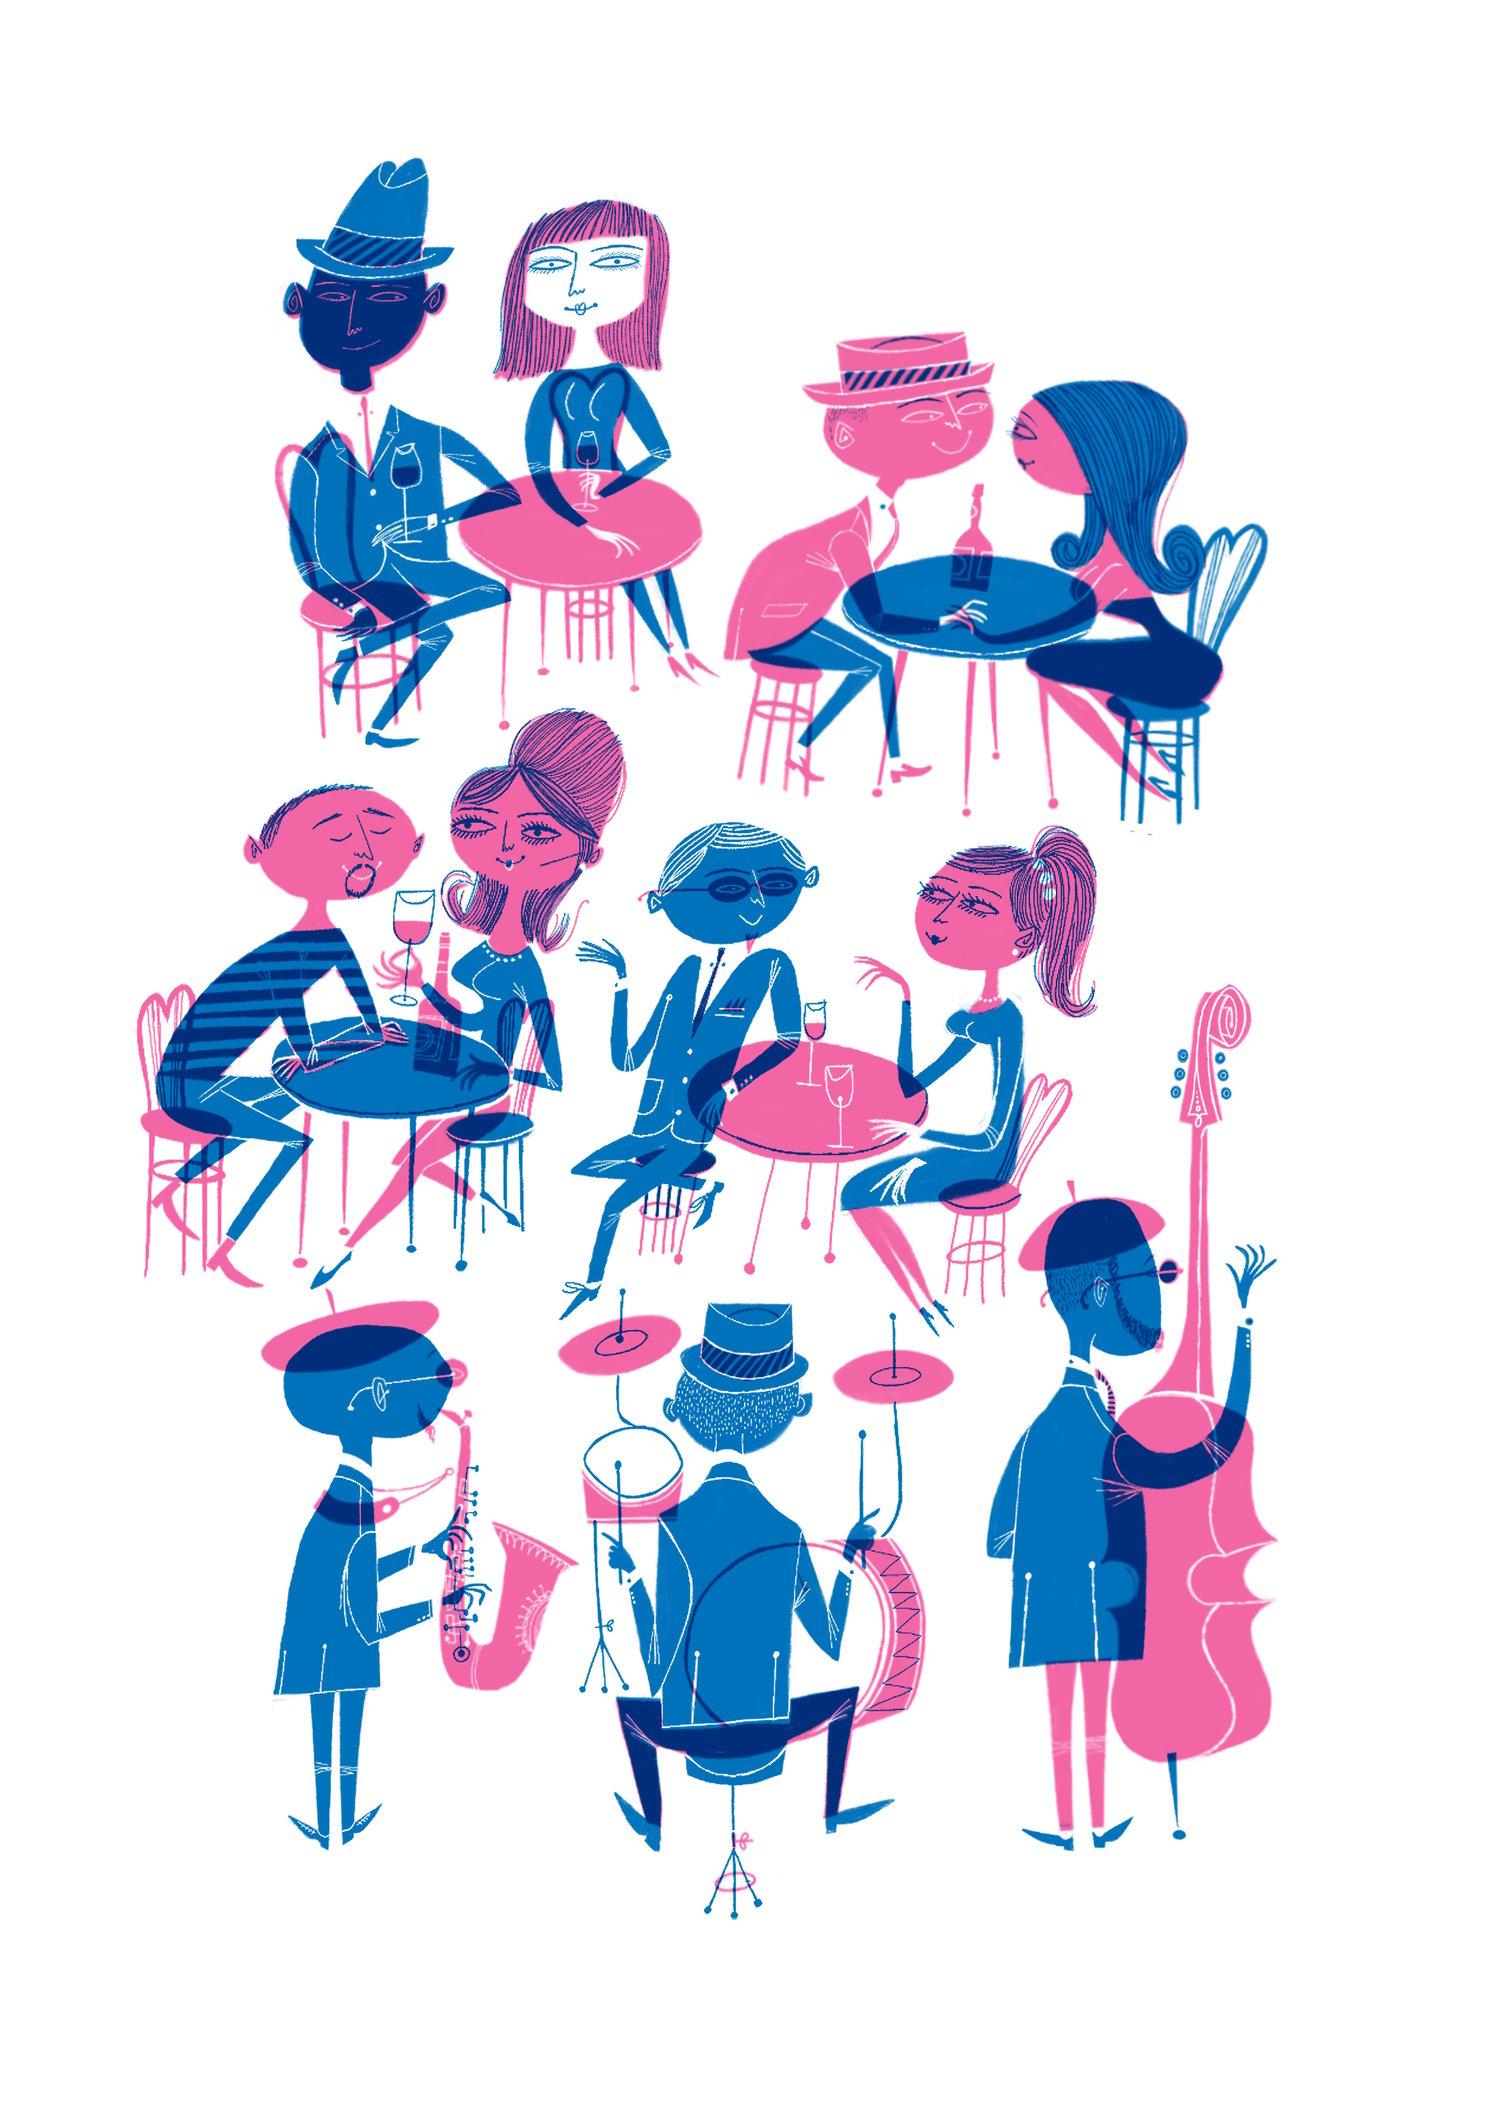 Image of jazzers